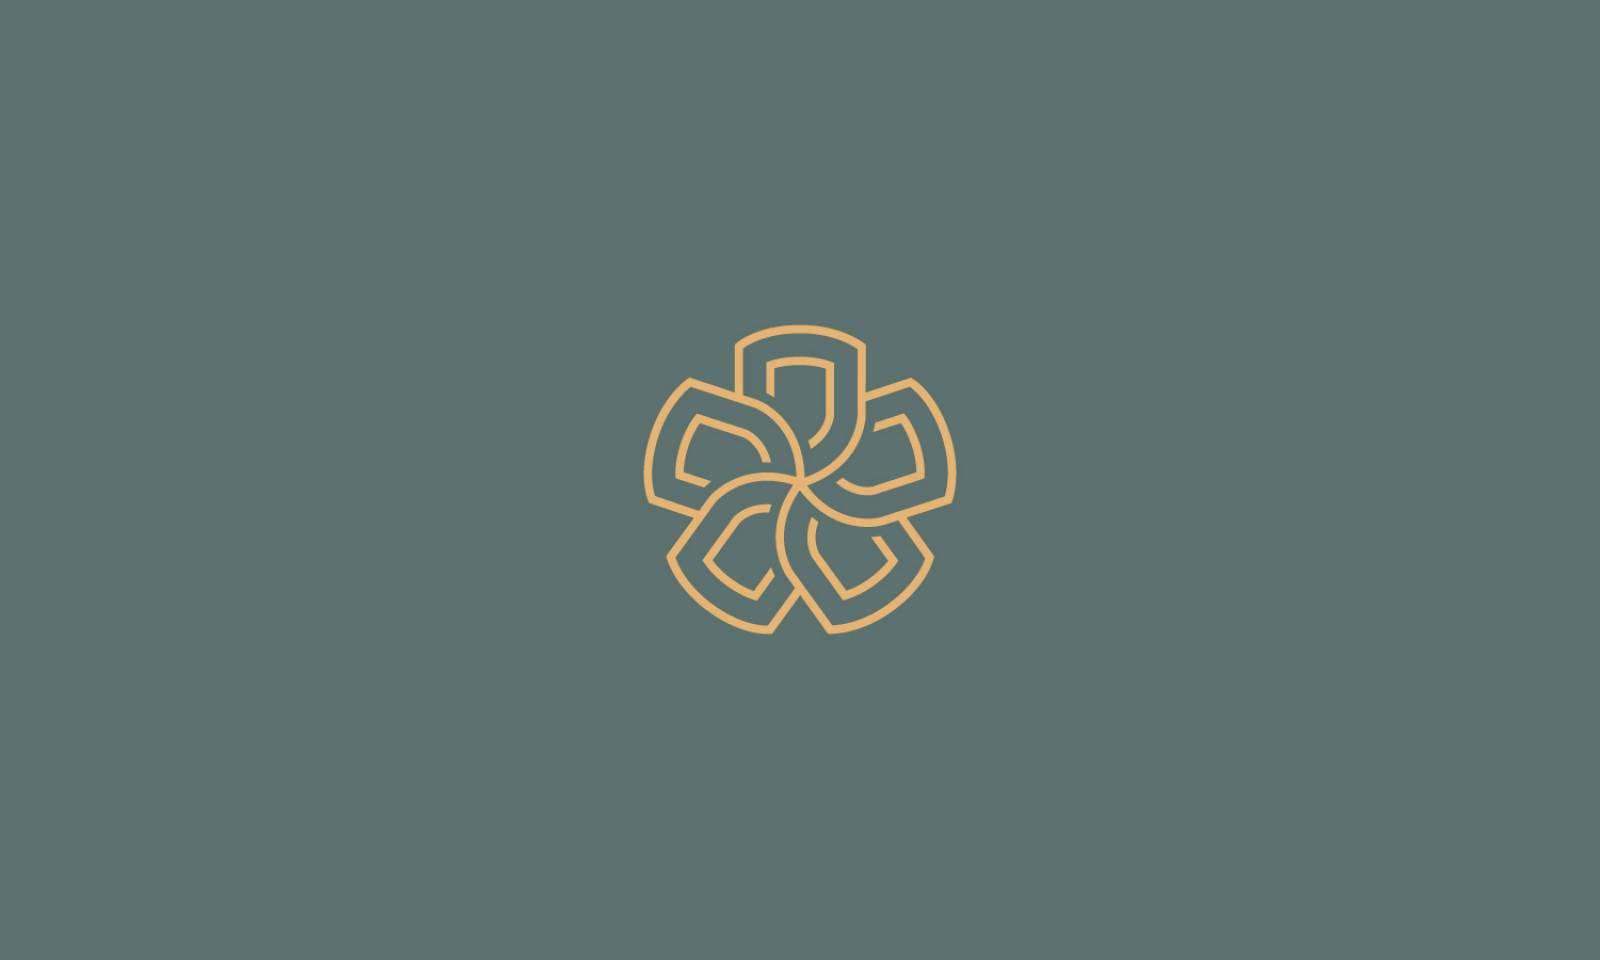 logo-FN-corporate-identity-agency-graphic-design-canterbury.jpg